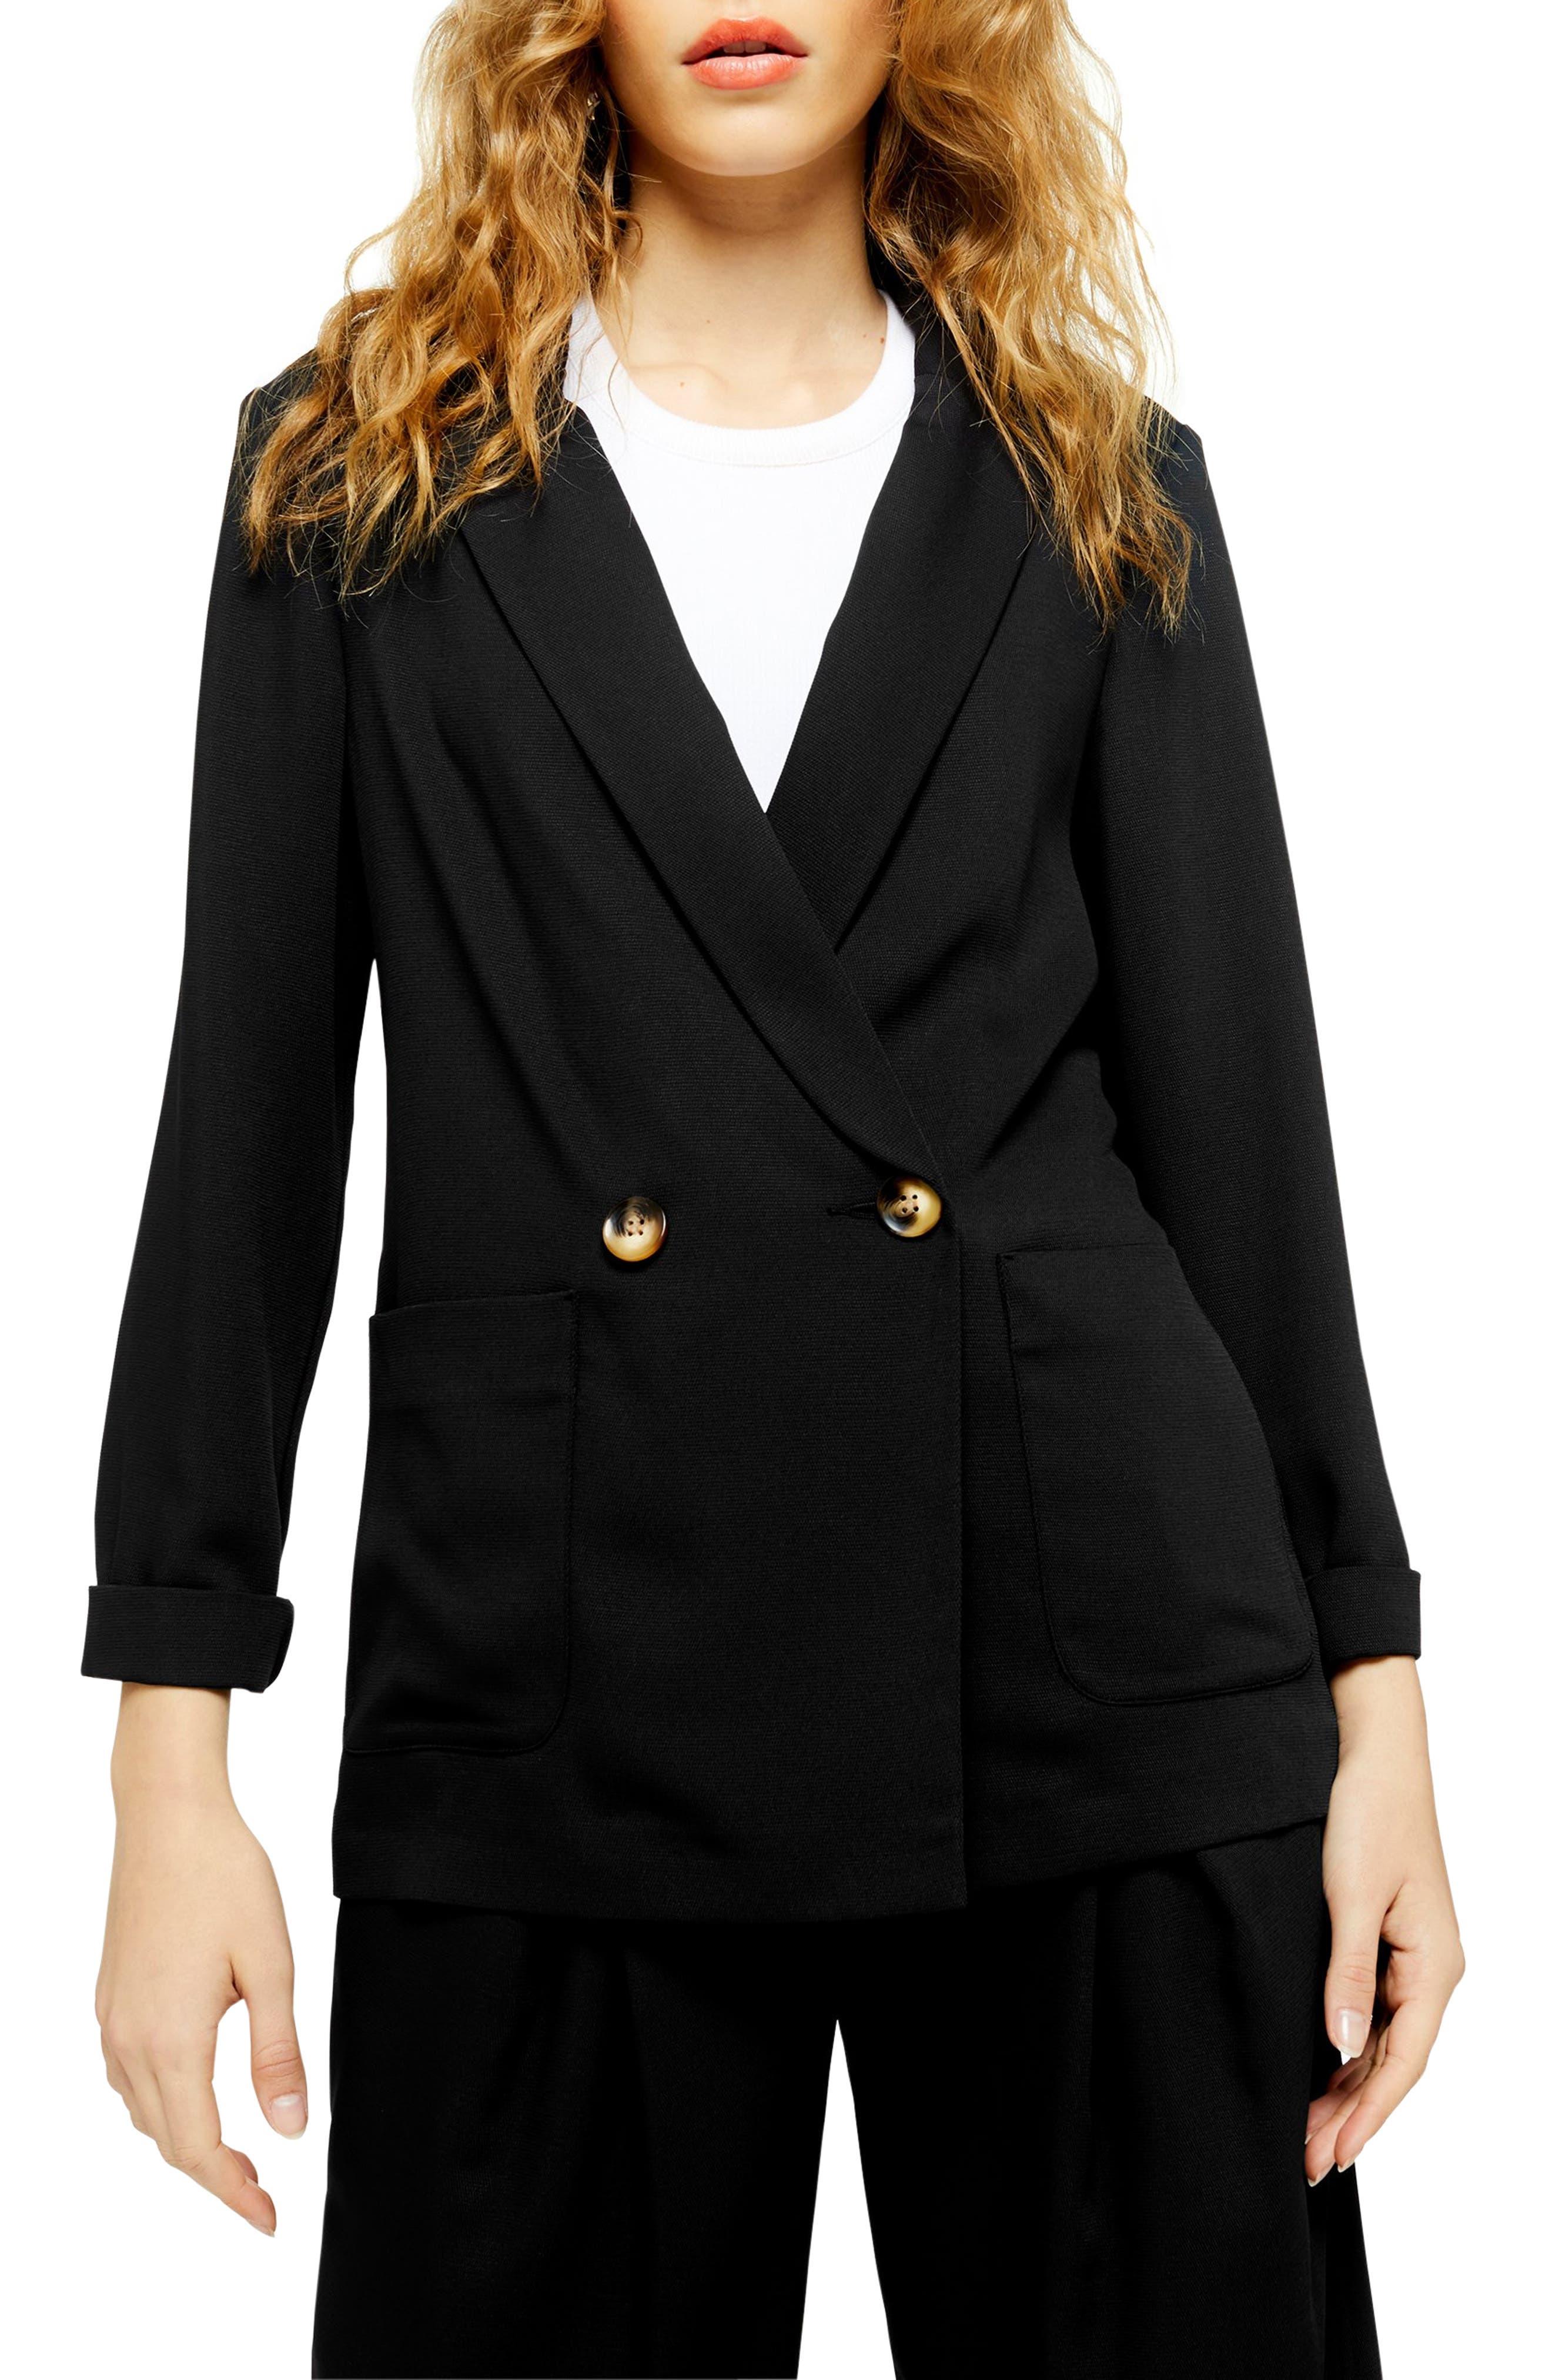 Vintage Suits Women | Work Wear & Office Wear Womens Topshop Geeta Blazer Size 0 US fits like 00 - Black $75.00 AT vintagedancer.com